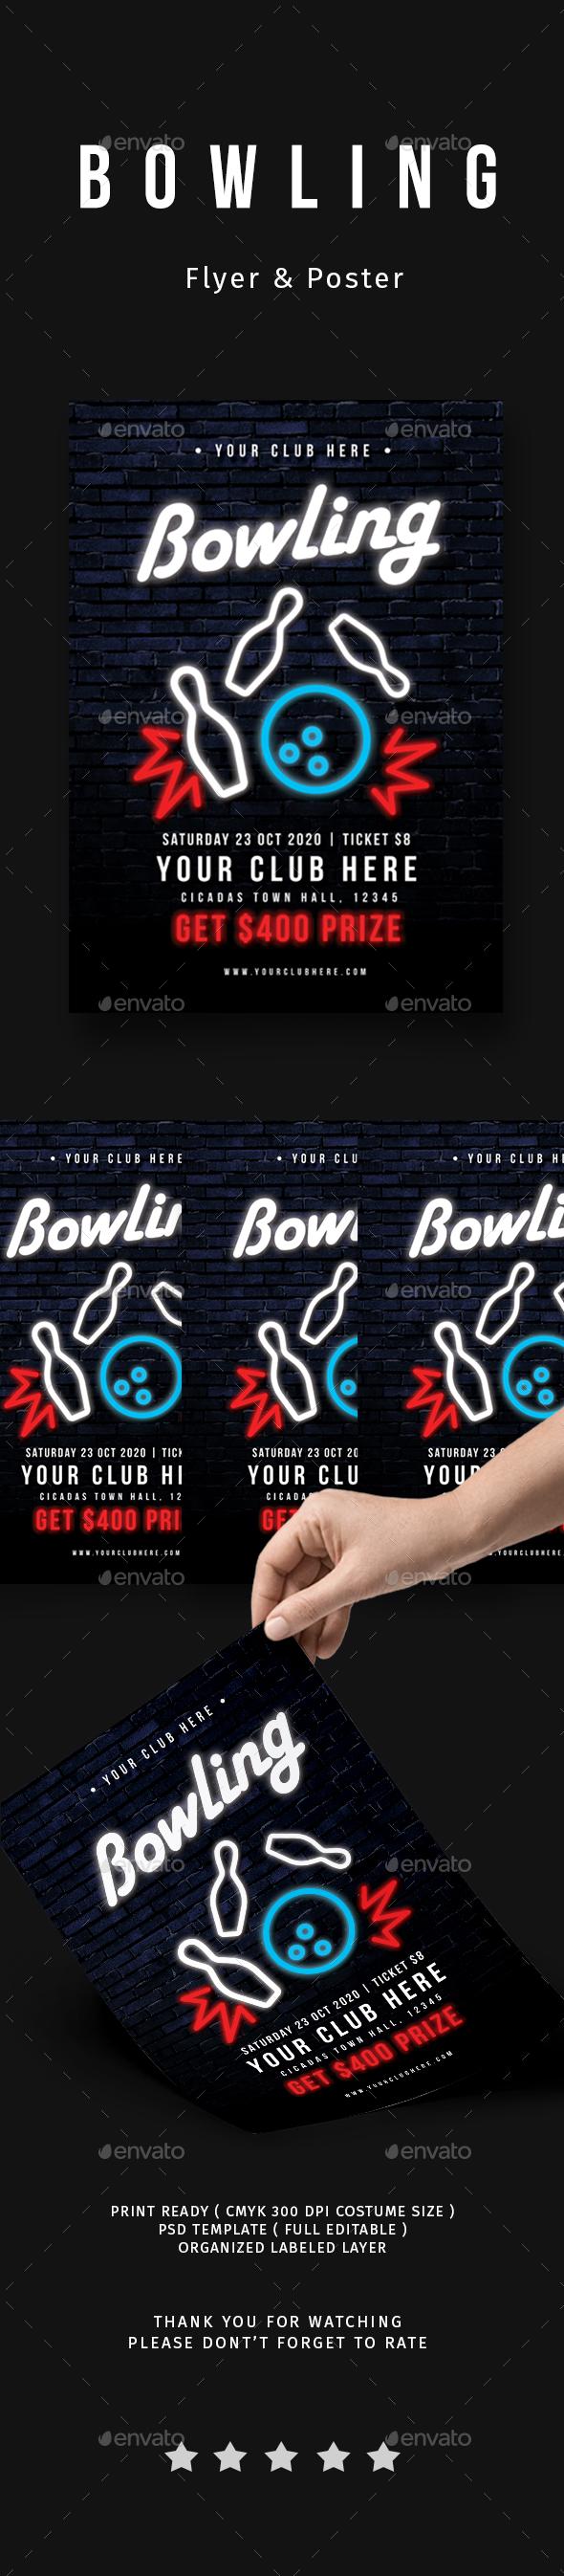 Bowling Tournament Flyer - Flyers Print Templates